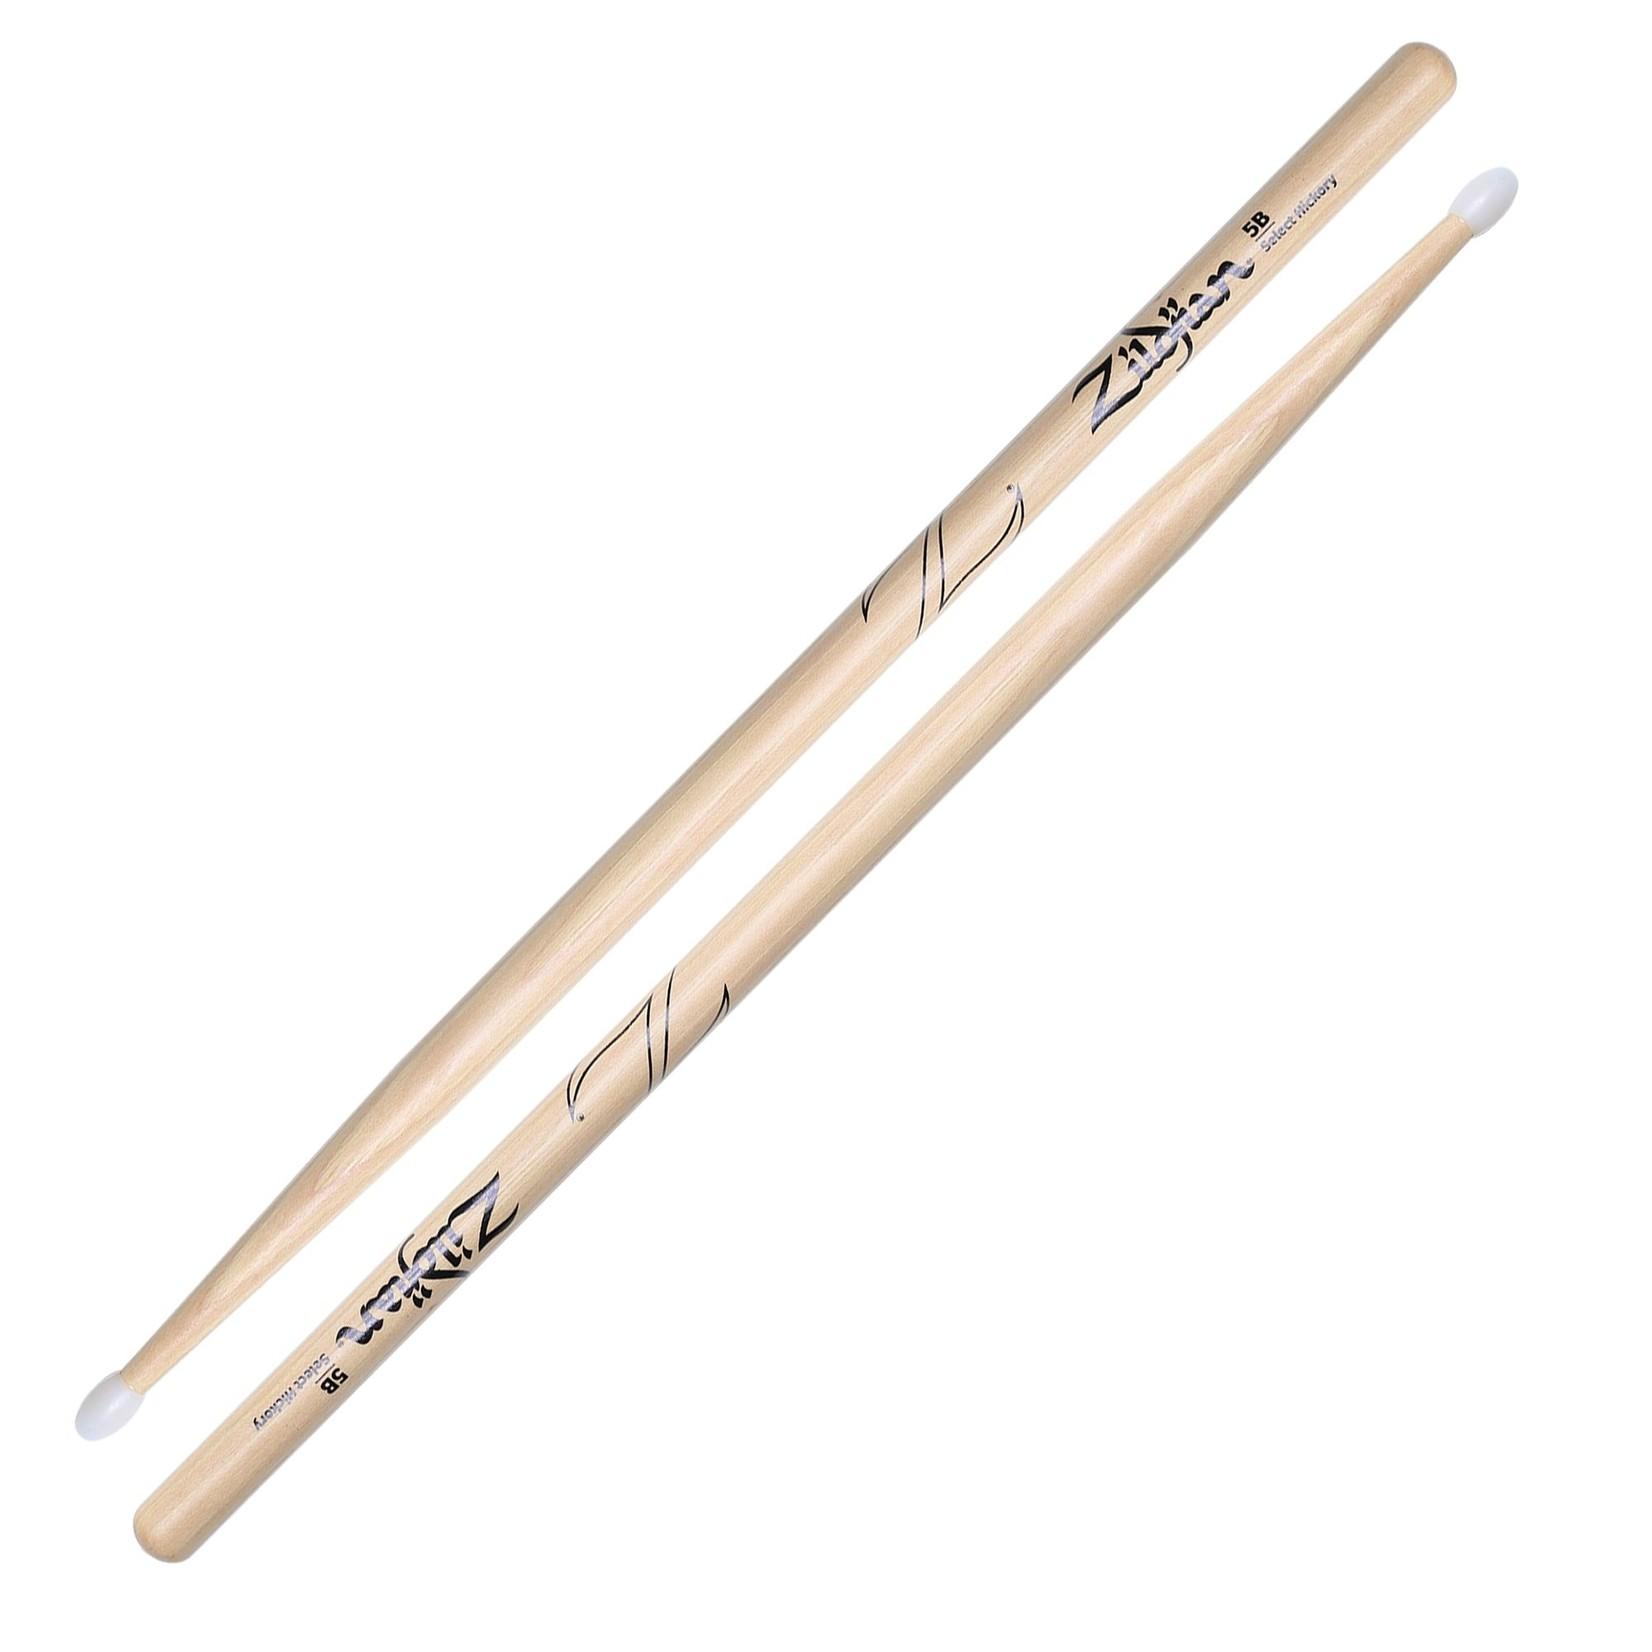 Zildjian Zildjian 5B Nylon Drumsticks